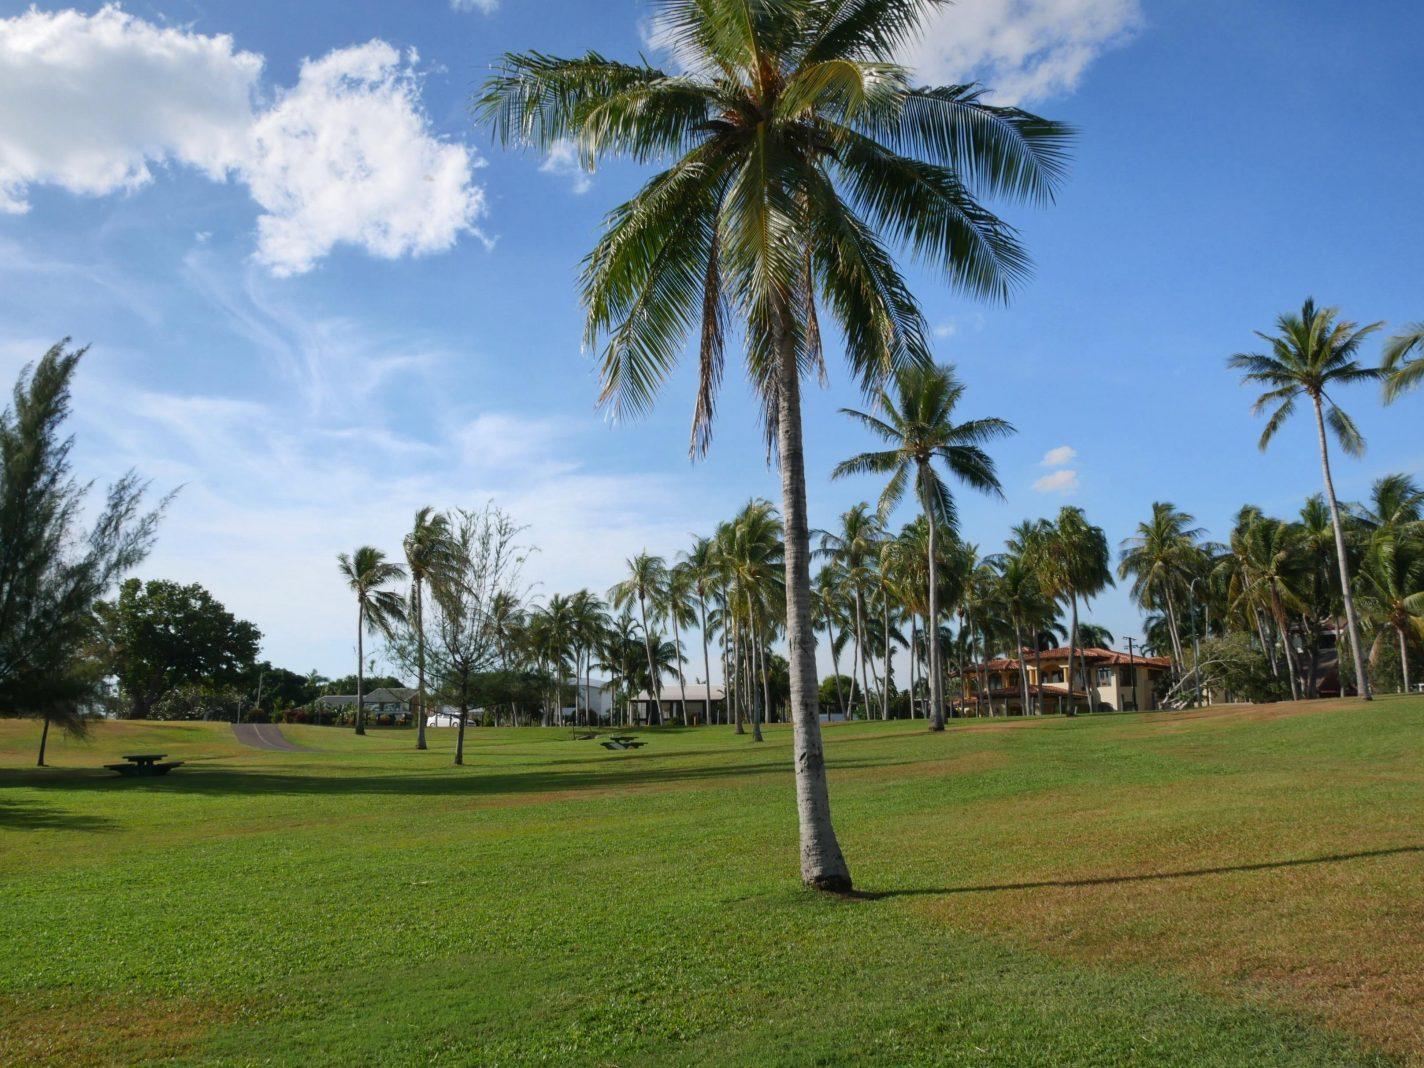 Grasveld met palmbomen en picknicktafels